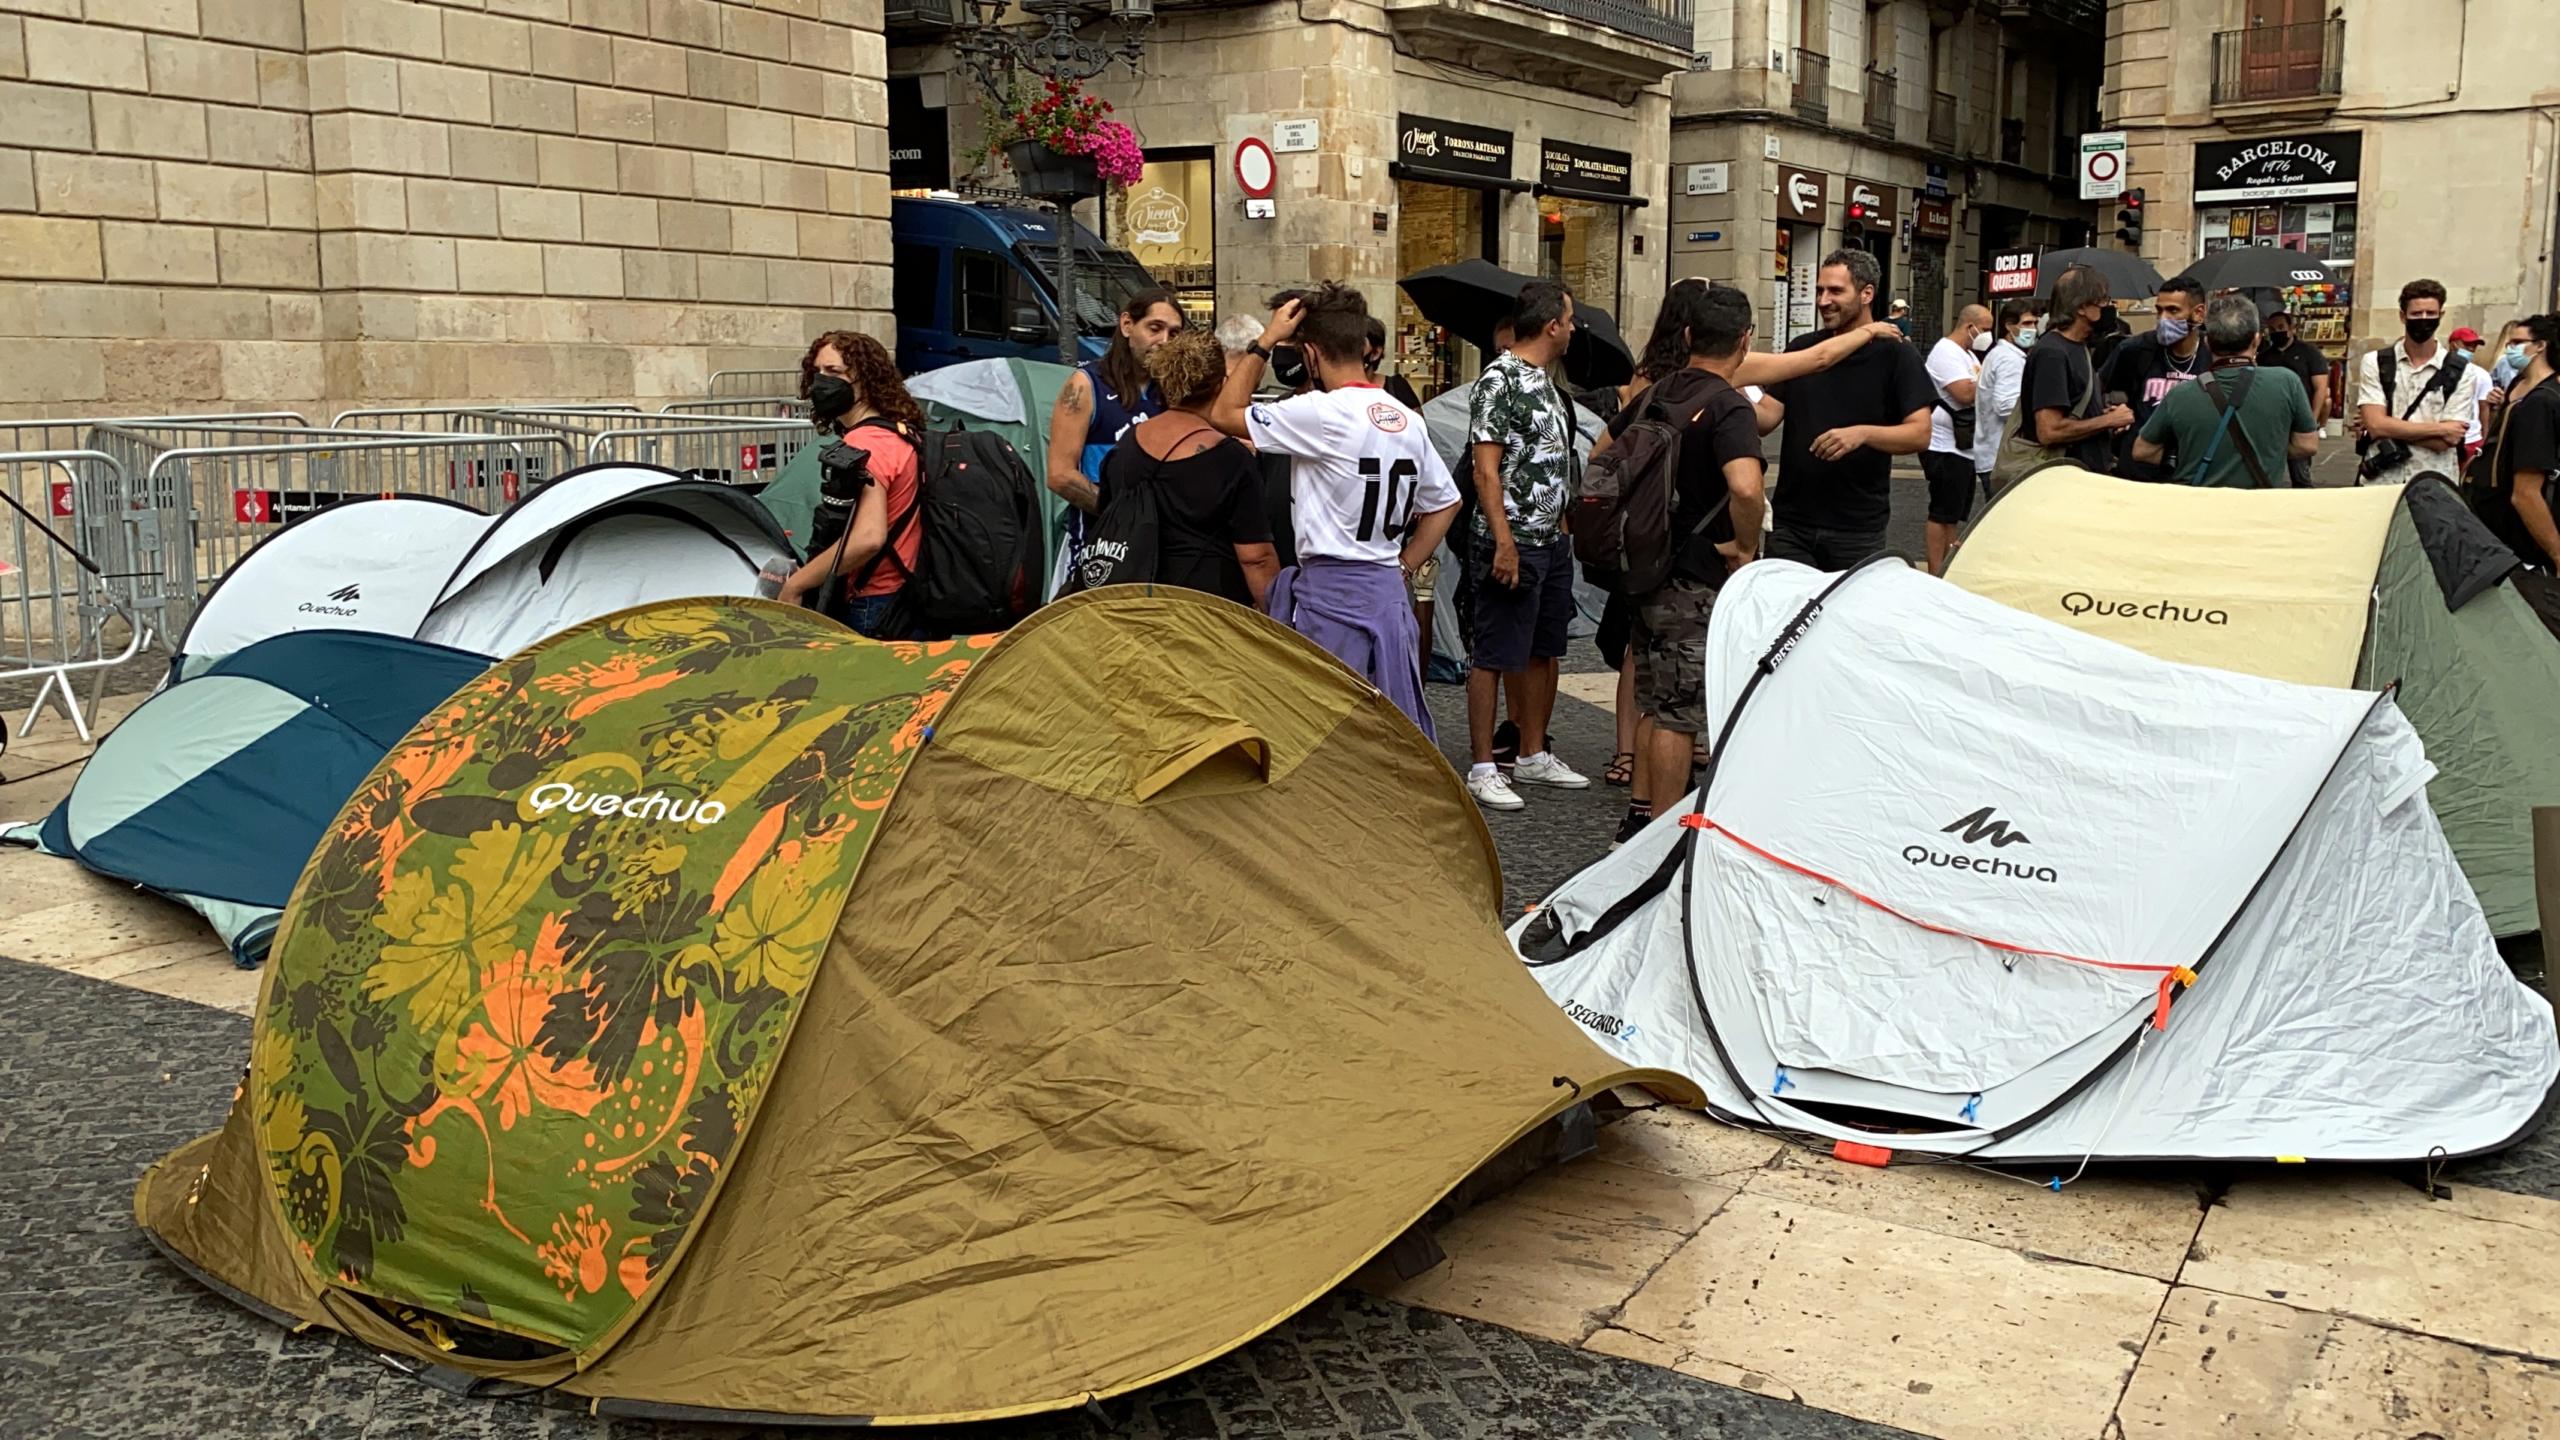 Empresaris de l'oci nocturn acampen a la plaça Sant Jaume / Marta Casado Pla (ACN)